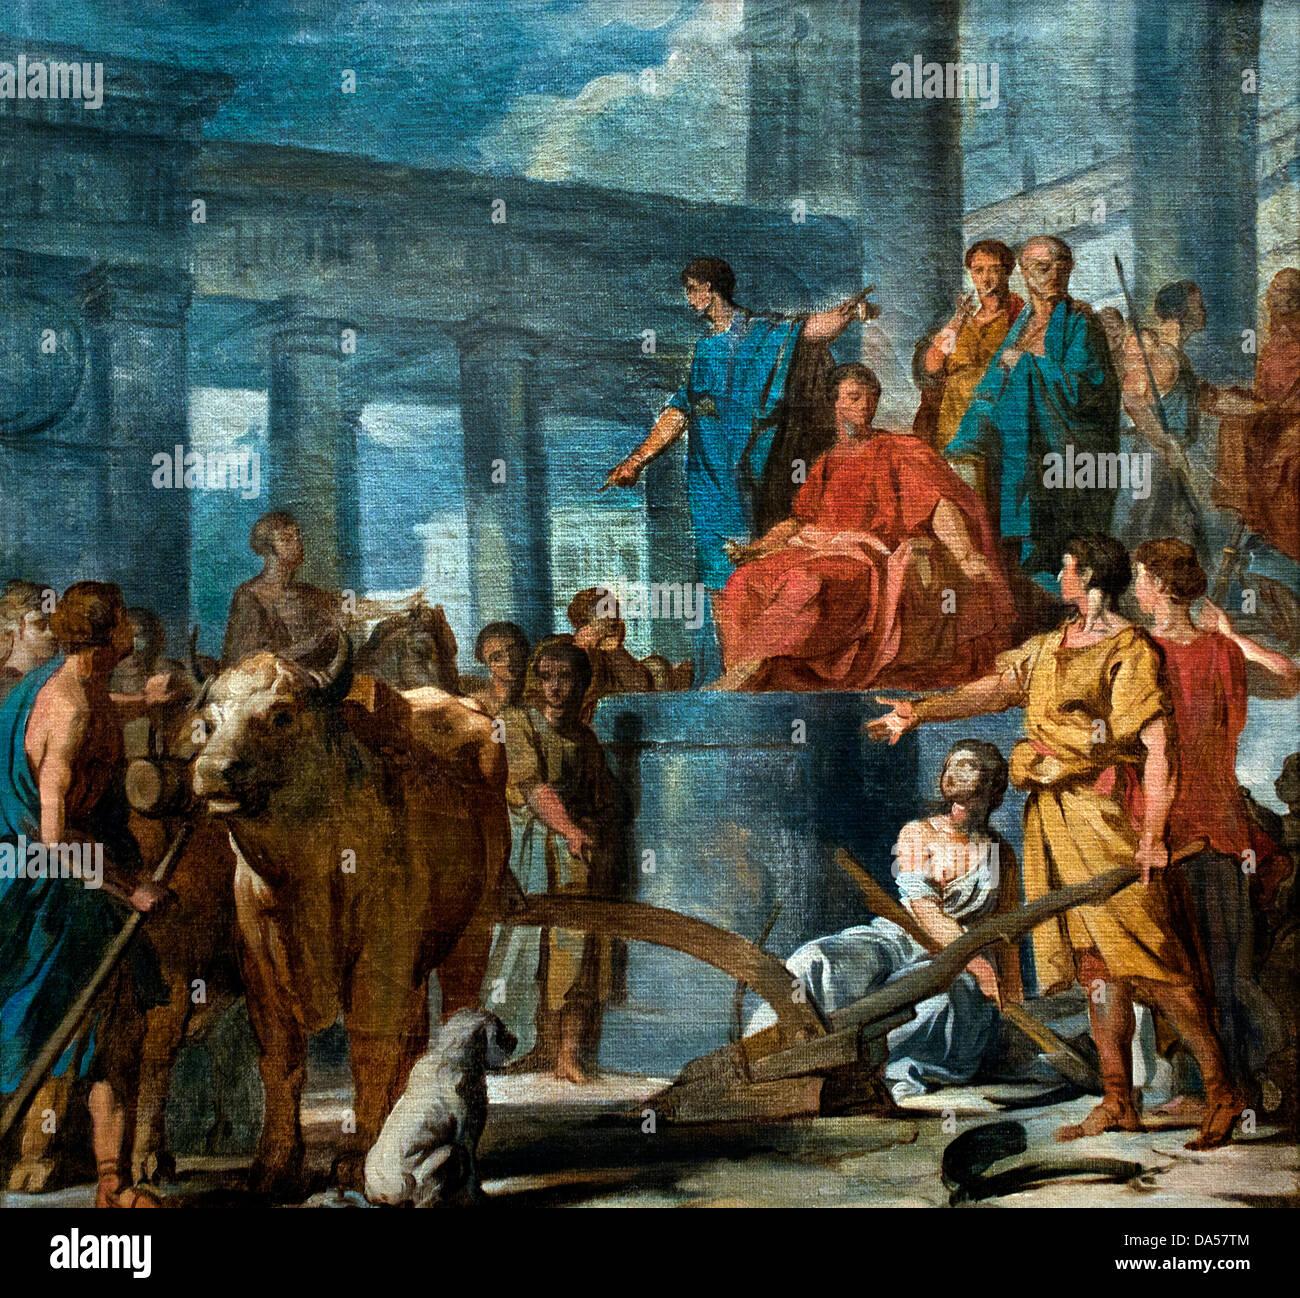 Caius Furious Cressinus accusé de sortilège 1775 Nicolas Guy Brenet 1728-1792 France French - Stock Image